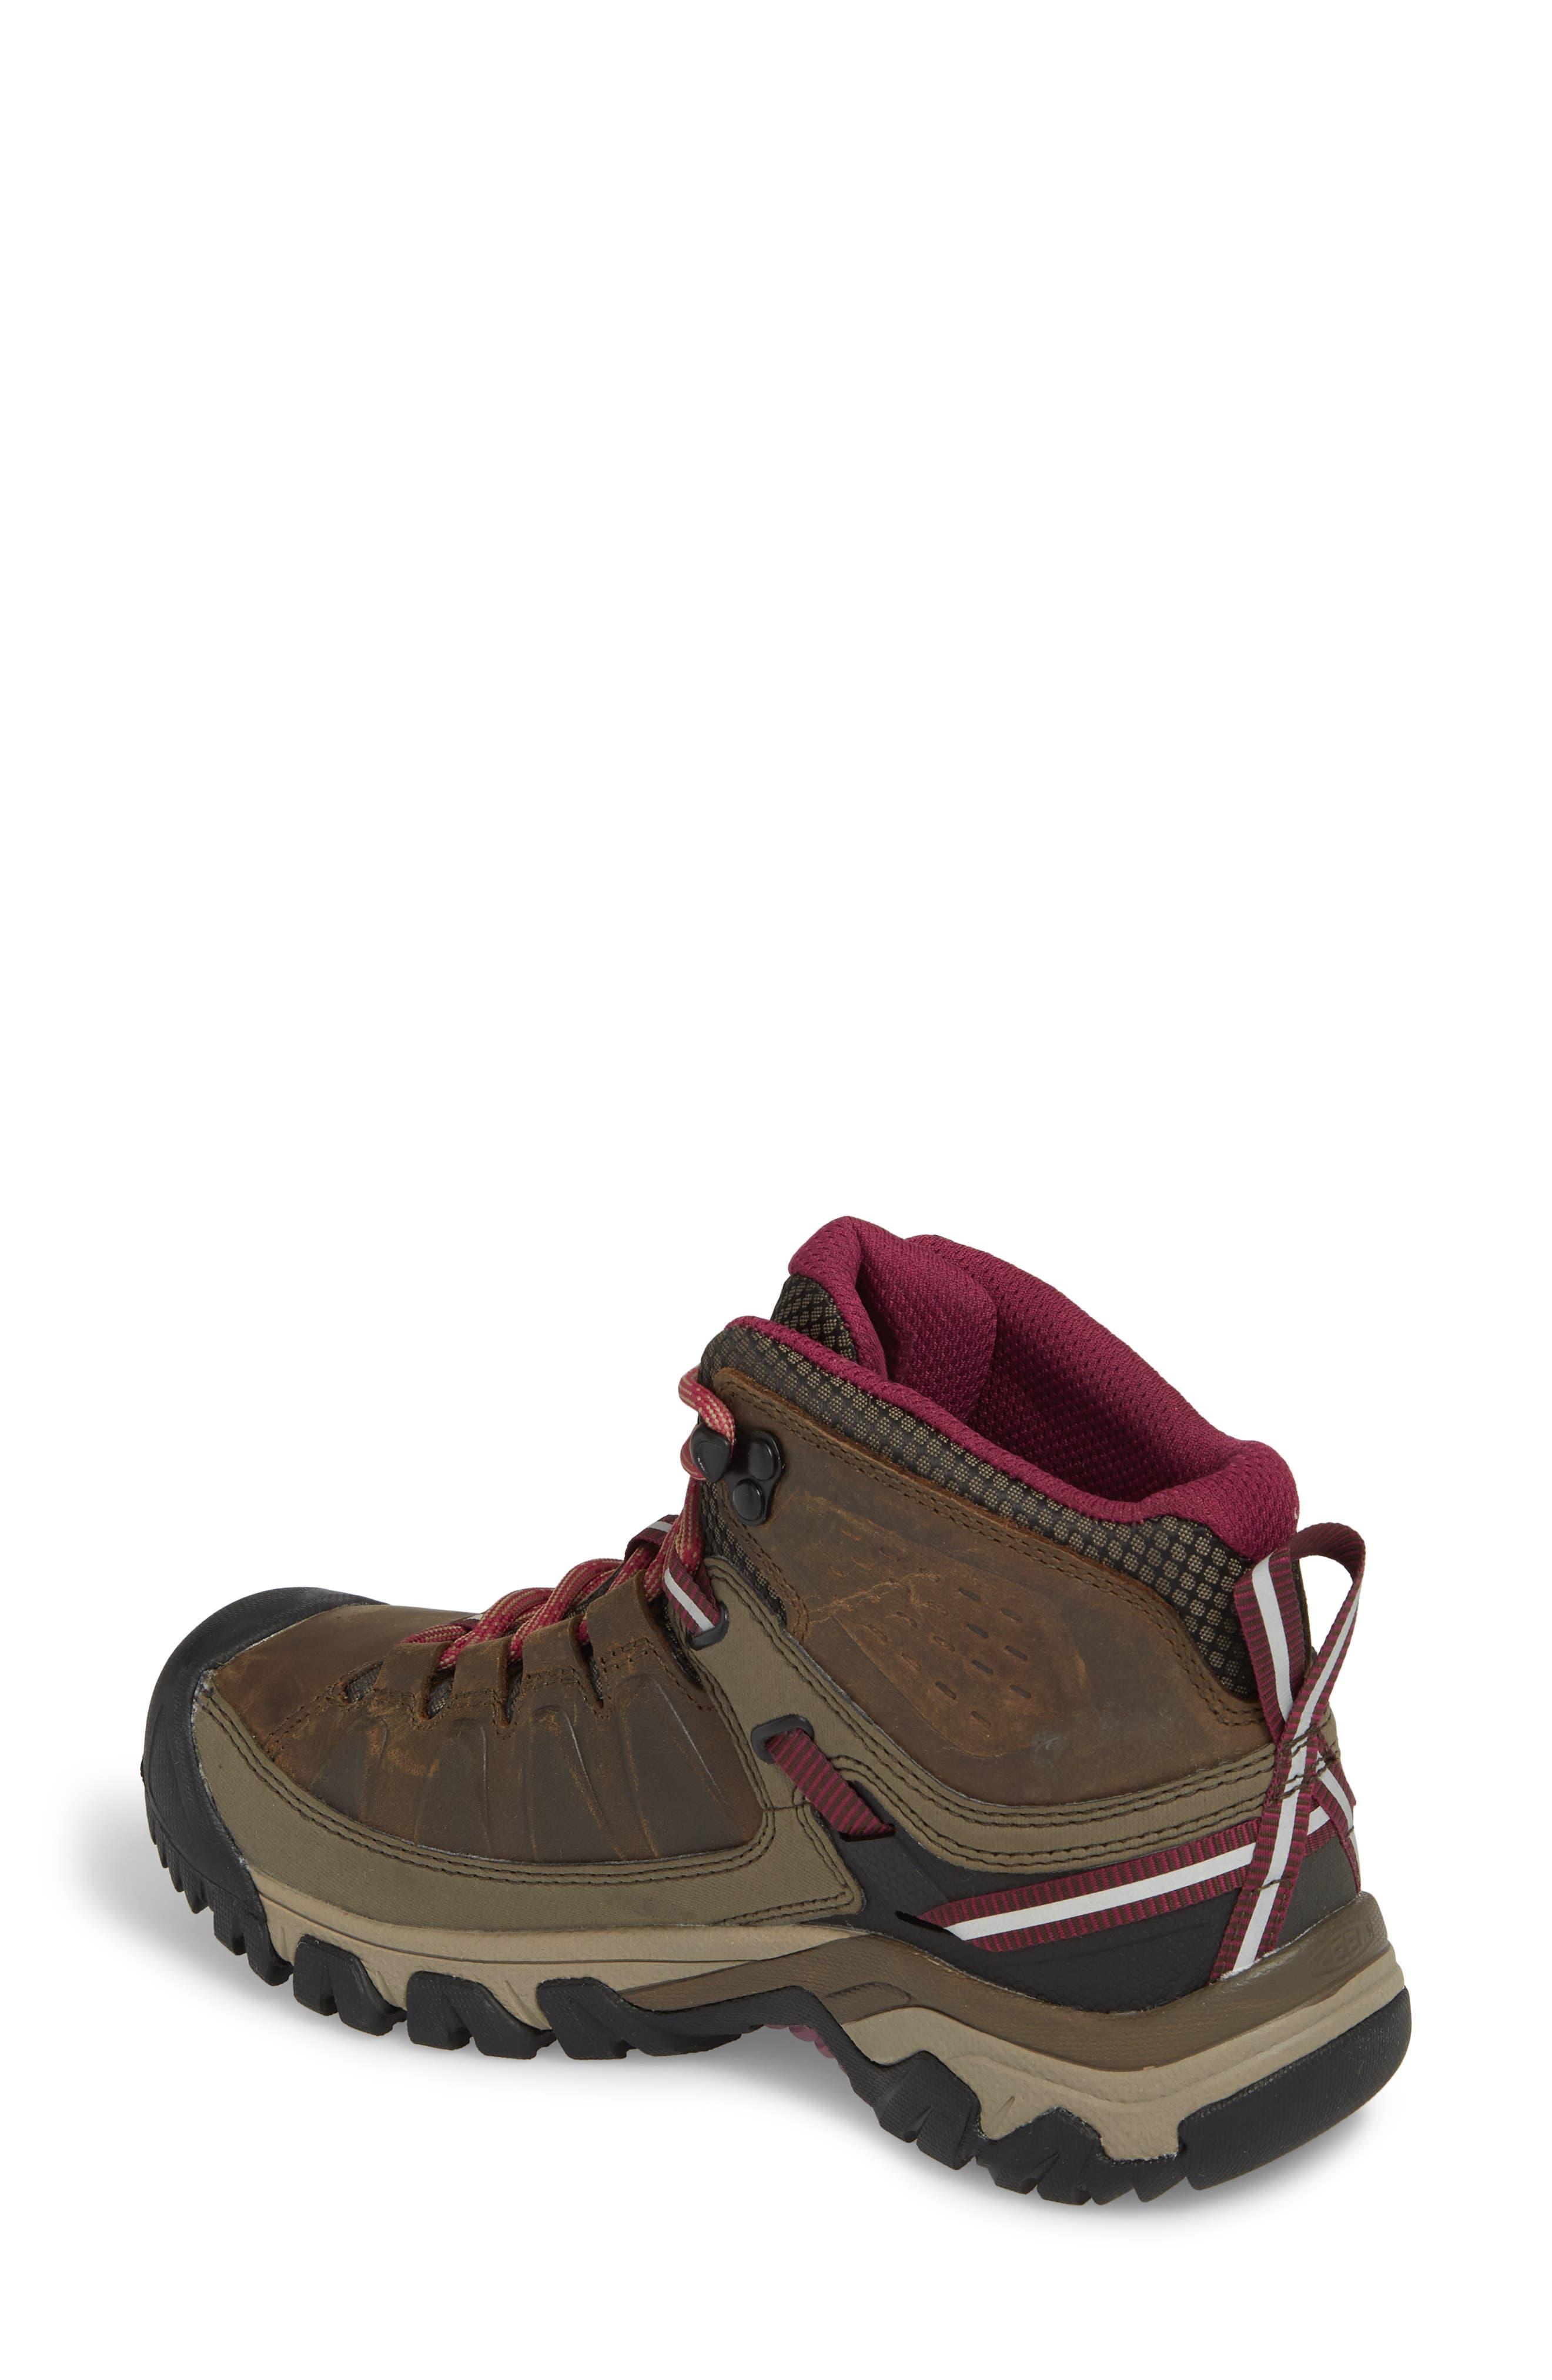 Targhee III Mid Waterproof Hiking Boot,                             Alternate thumbnail 2, color,                             Weiss/ Boysenberry Leather